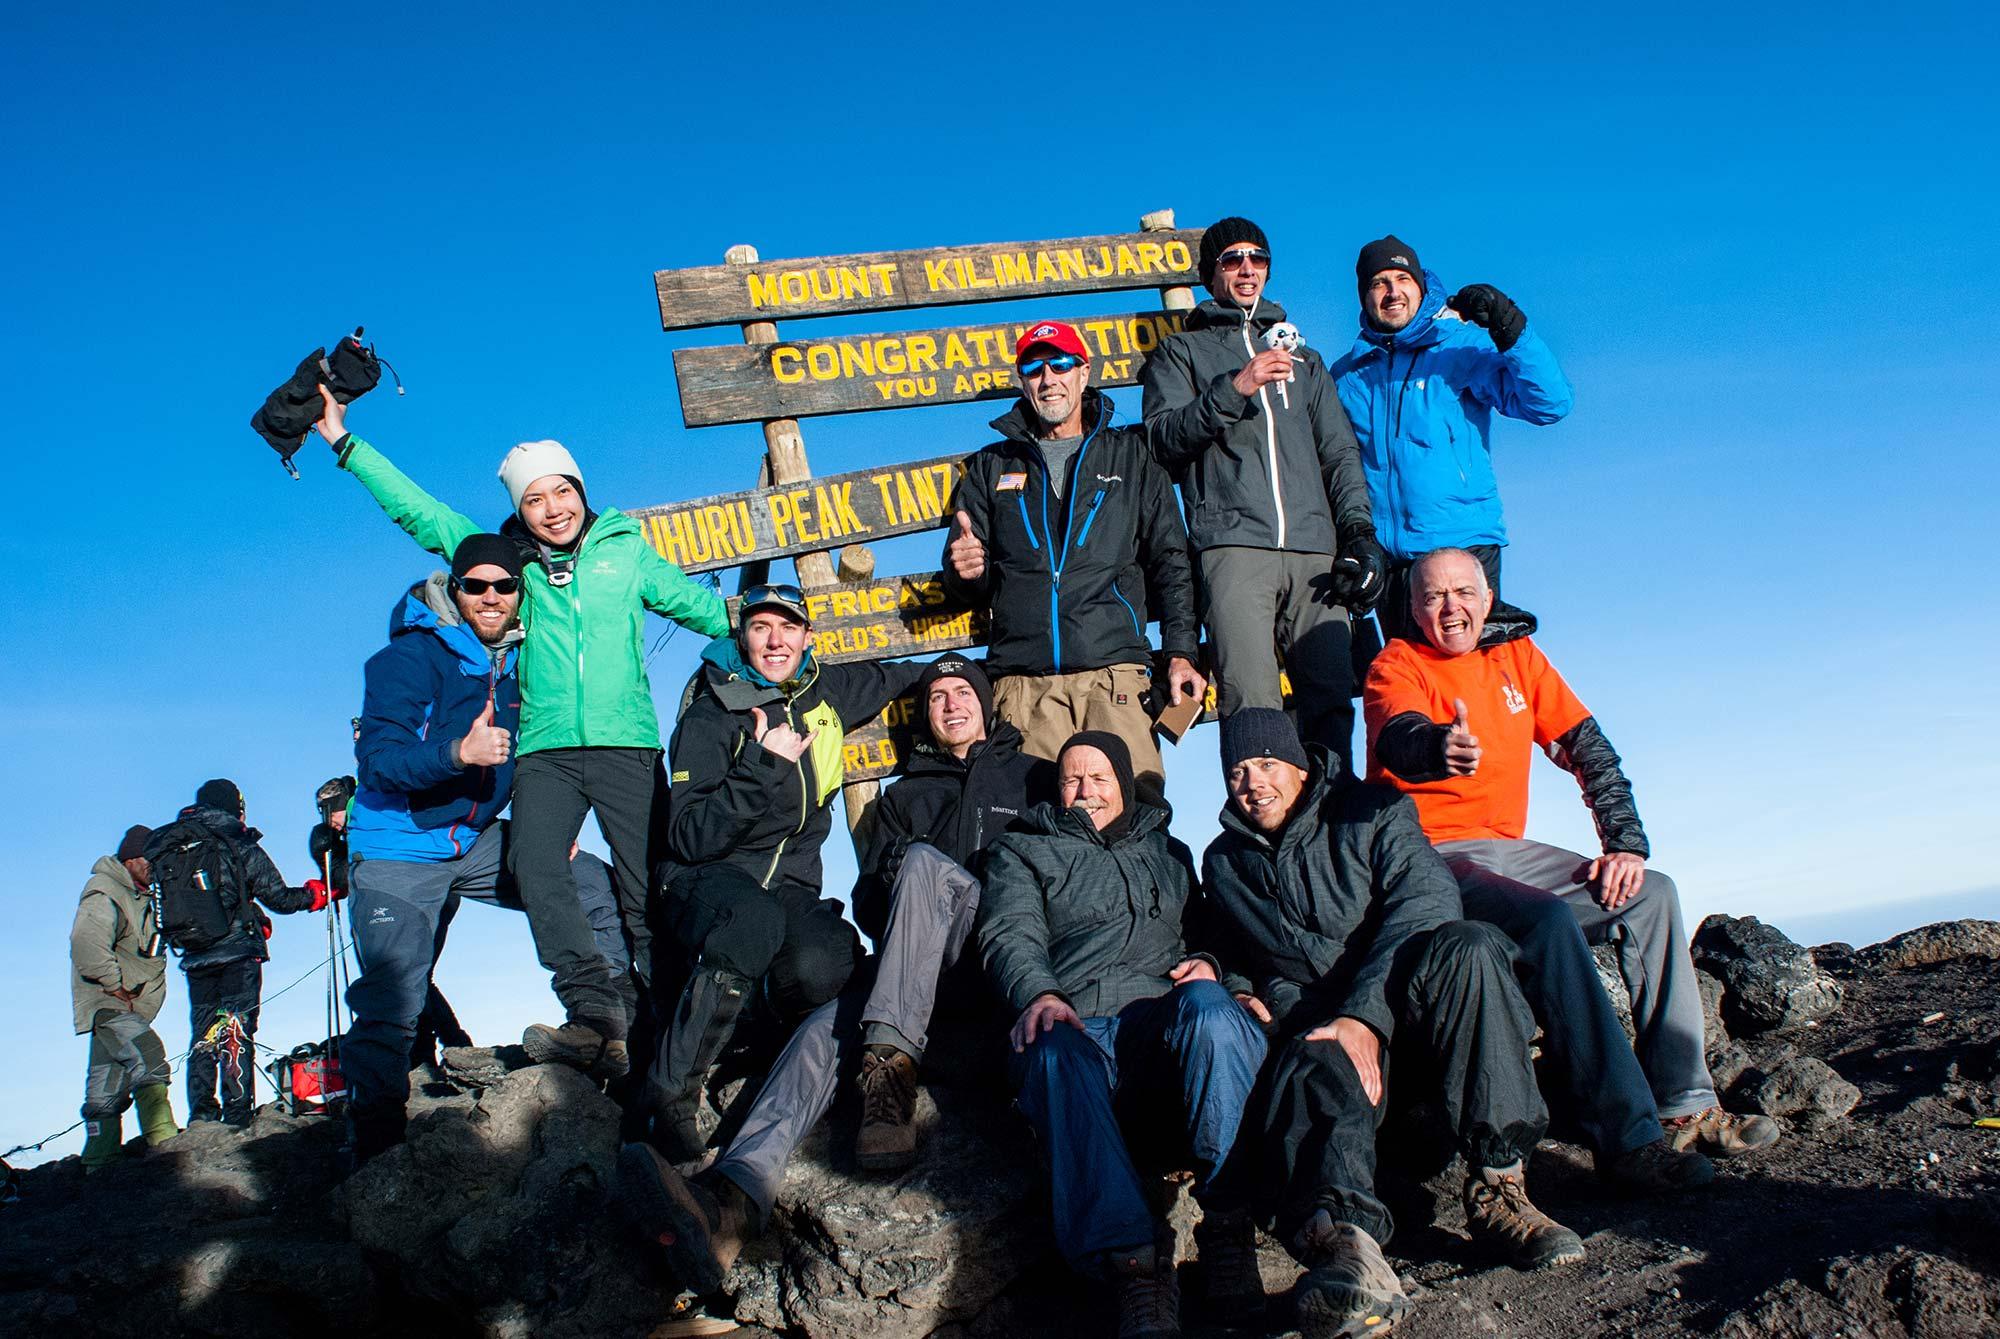 Februrary 22, 2016: All climbers from the Duma Explorer group successfully summited Kilimanjaro.